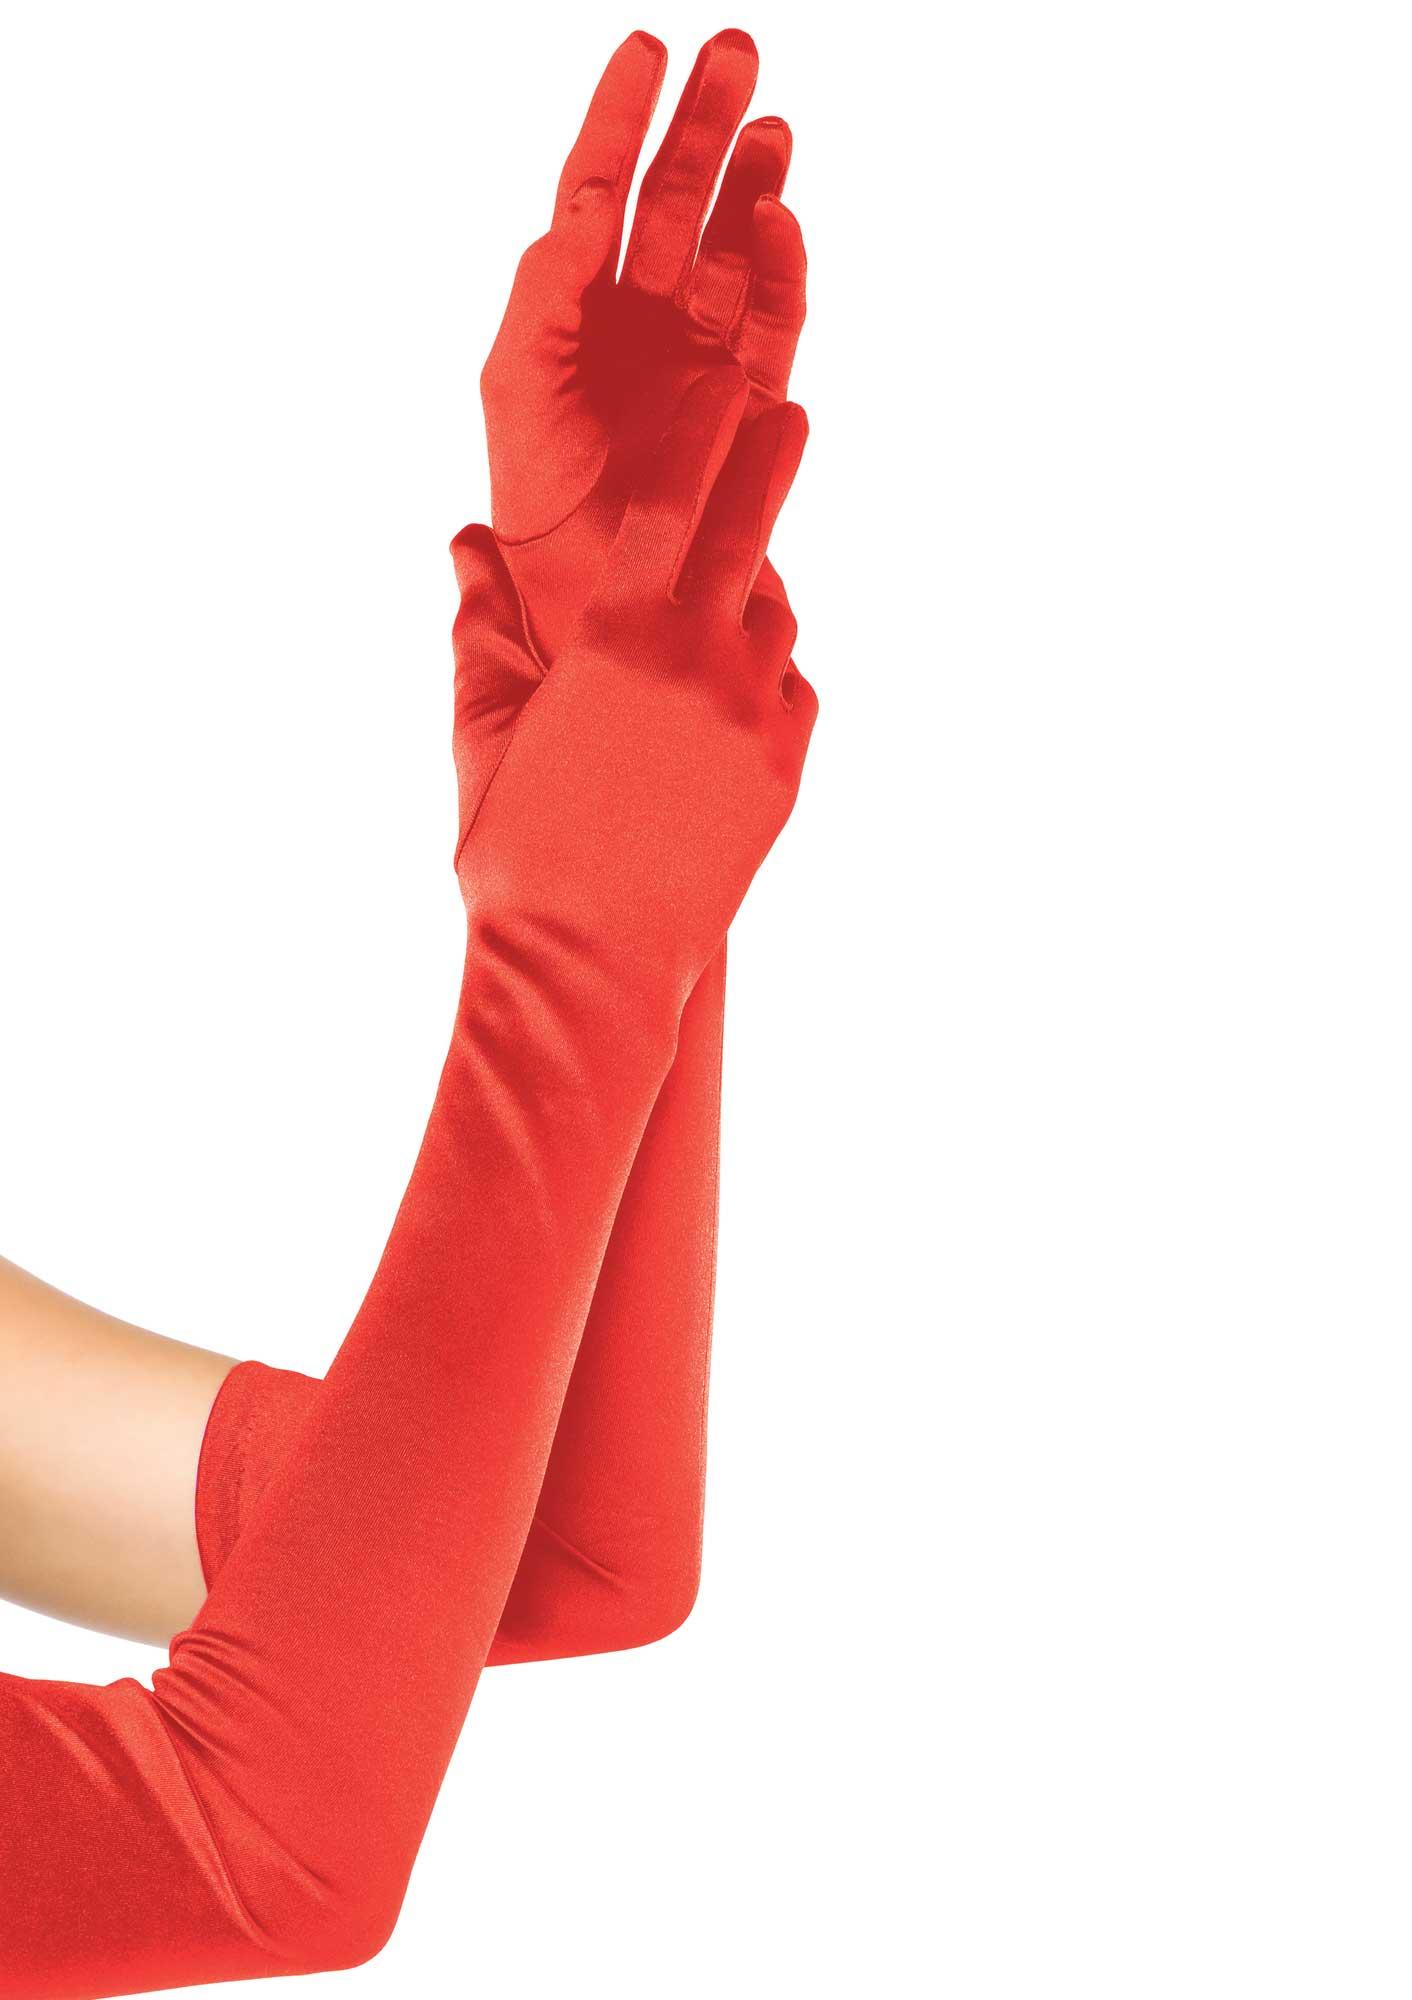 Red Satin Opera Length Gloves 0016 Edmonton